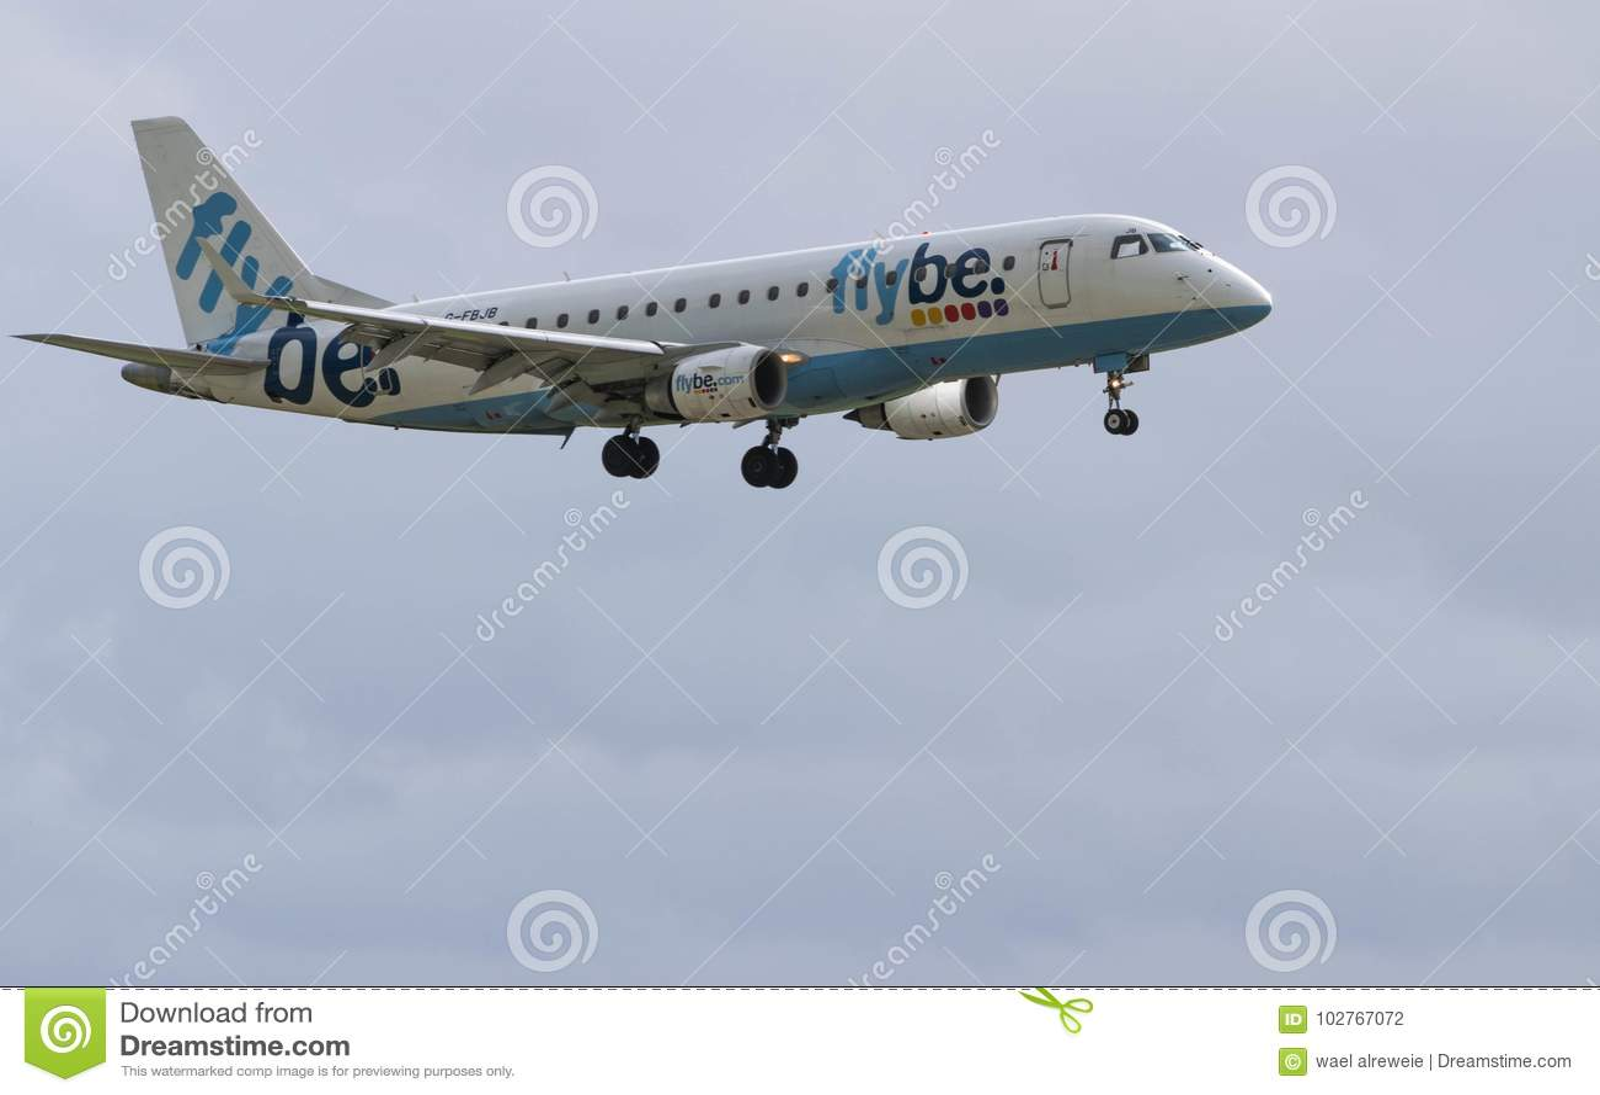 BIRMINGHAM INTERNATIONAL AIRPORT, BIRMINGHAM, UNITED KINGDOM - OCTOBER 28, 2017: a Flybe Airlines aeroplane landing in